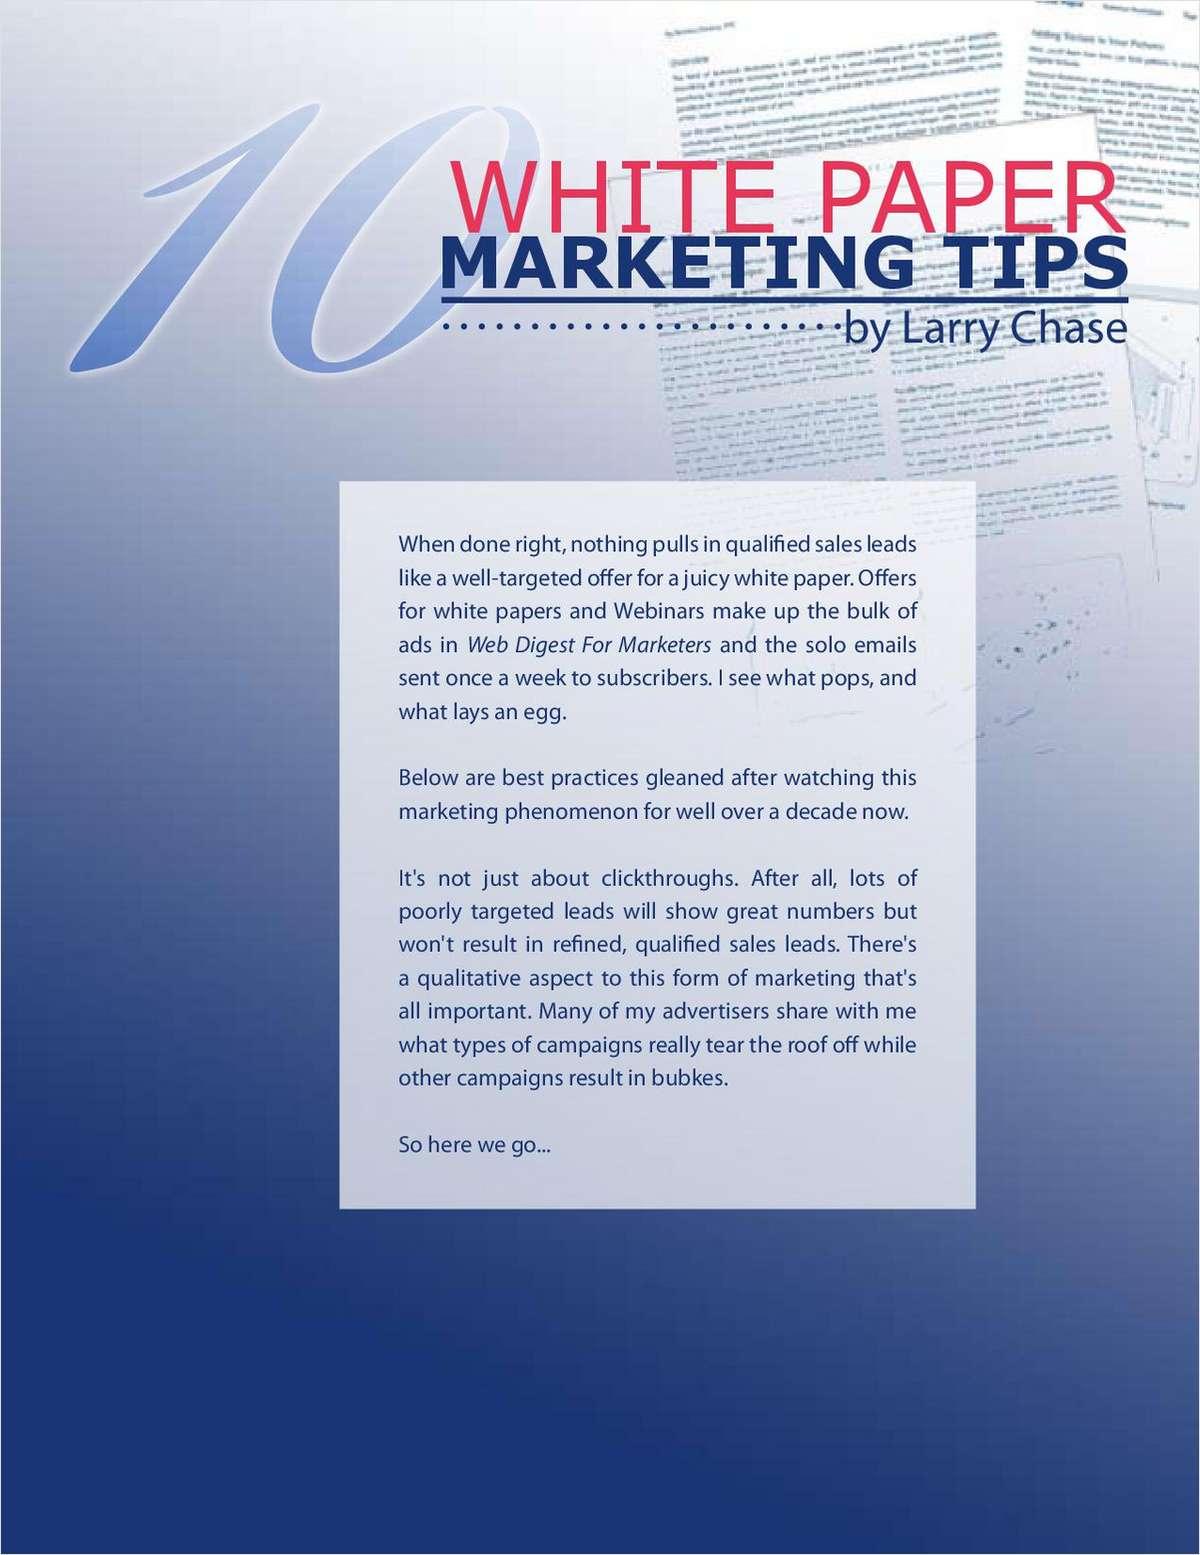 10 White Paper Marketing Tips